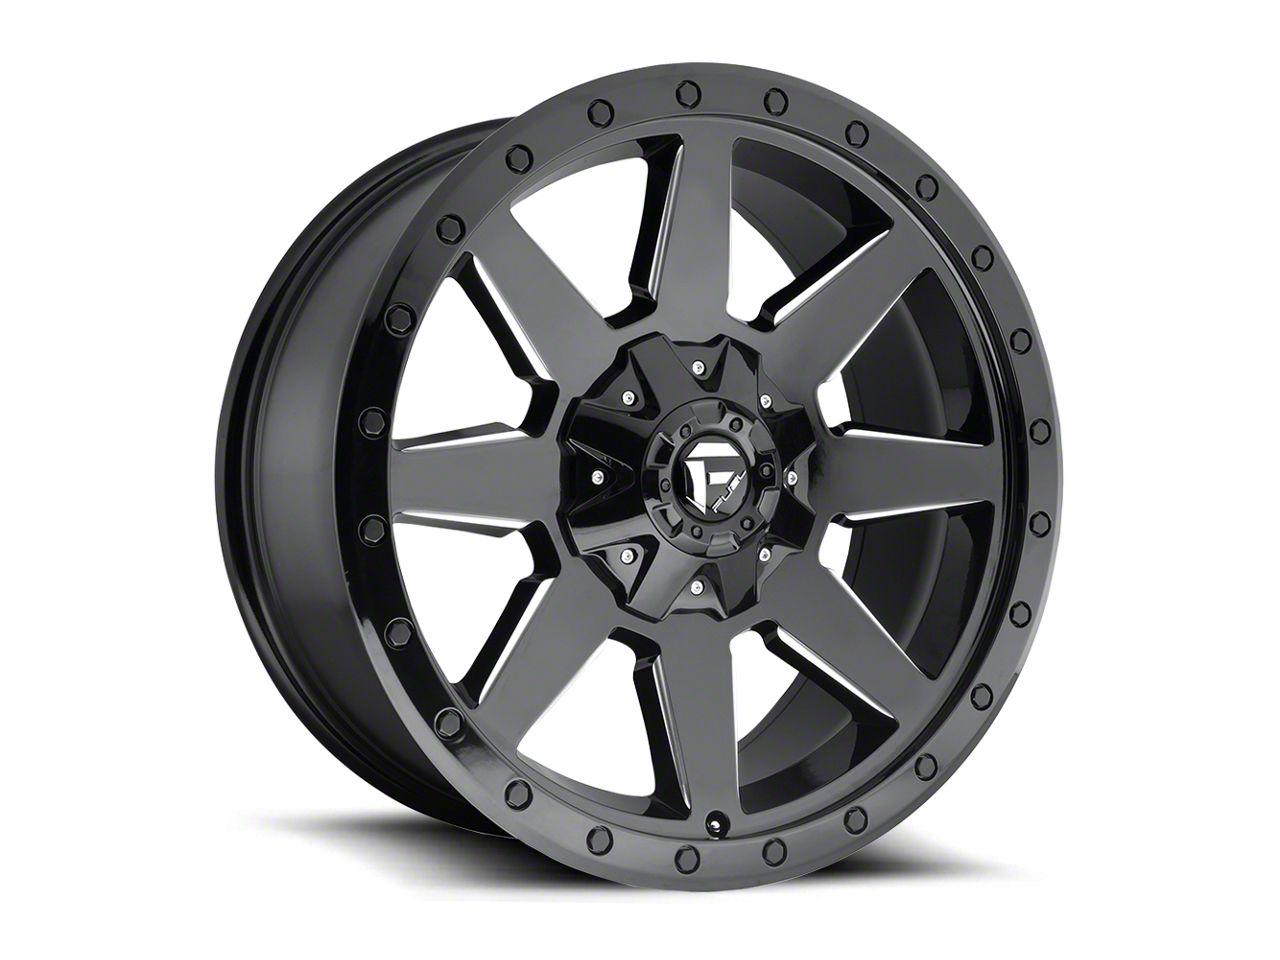 Fuel Wheels Wildcat Gloss Black Milled 6-Lug Wheel - 20x9 (99-18 Silverado 1500)